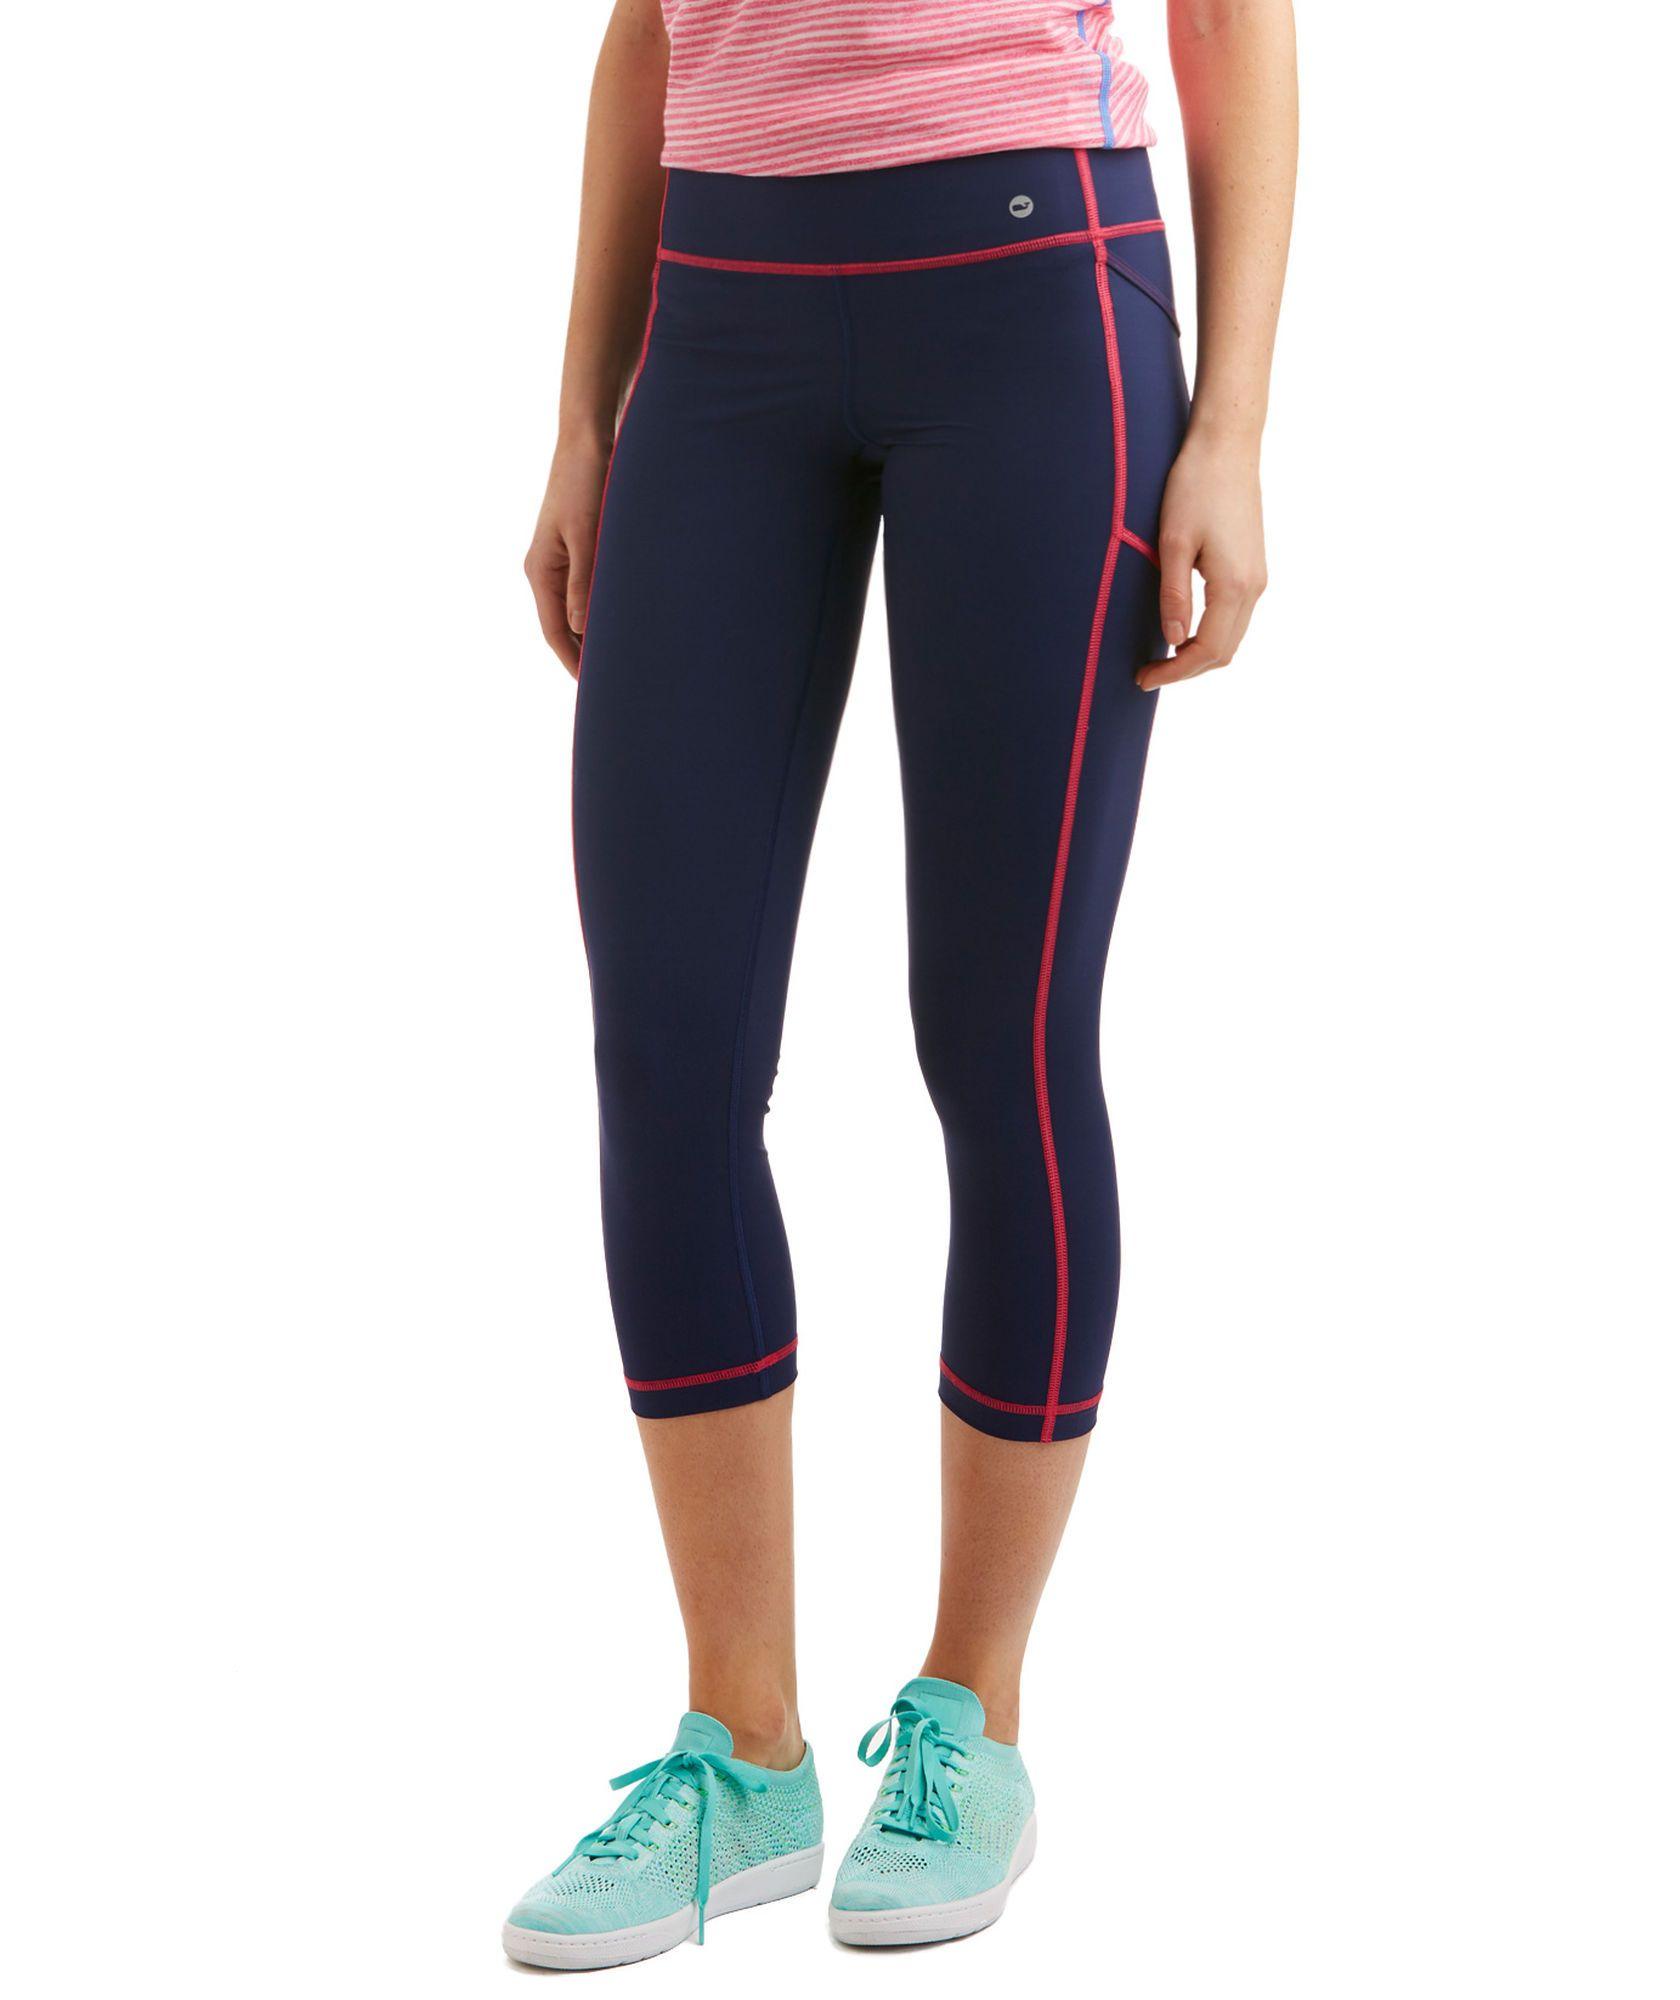 d39fc2c6fa2994 Solid Performance Crop Leggings | want!!! | Pants, Leggings y Pants ...